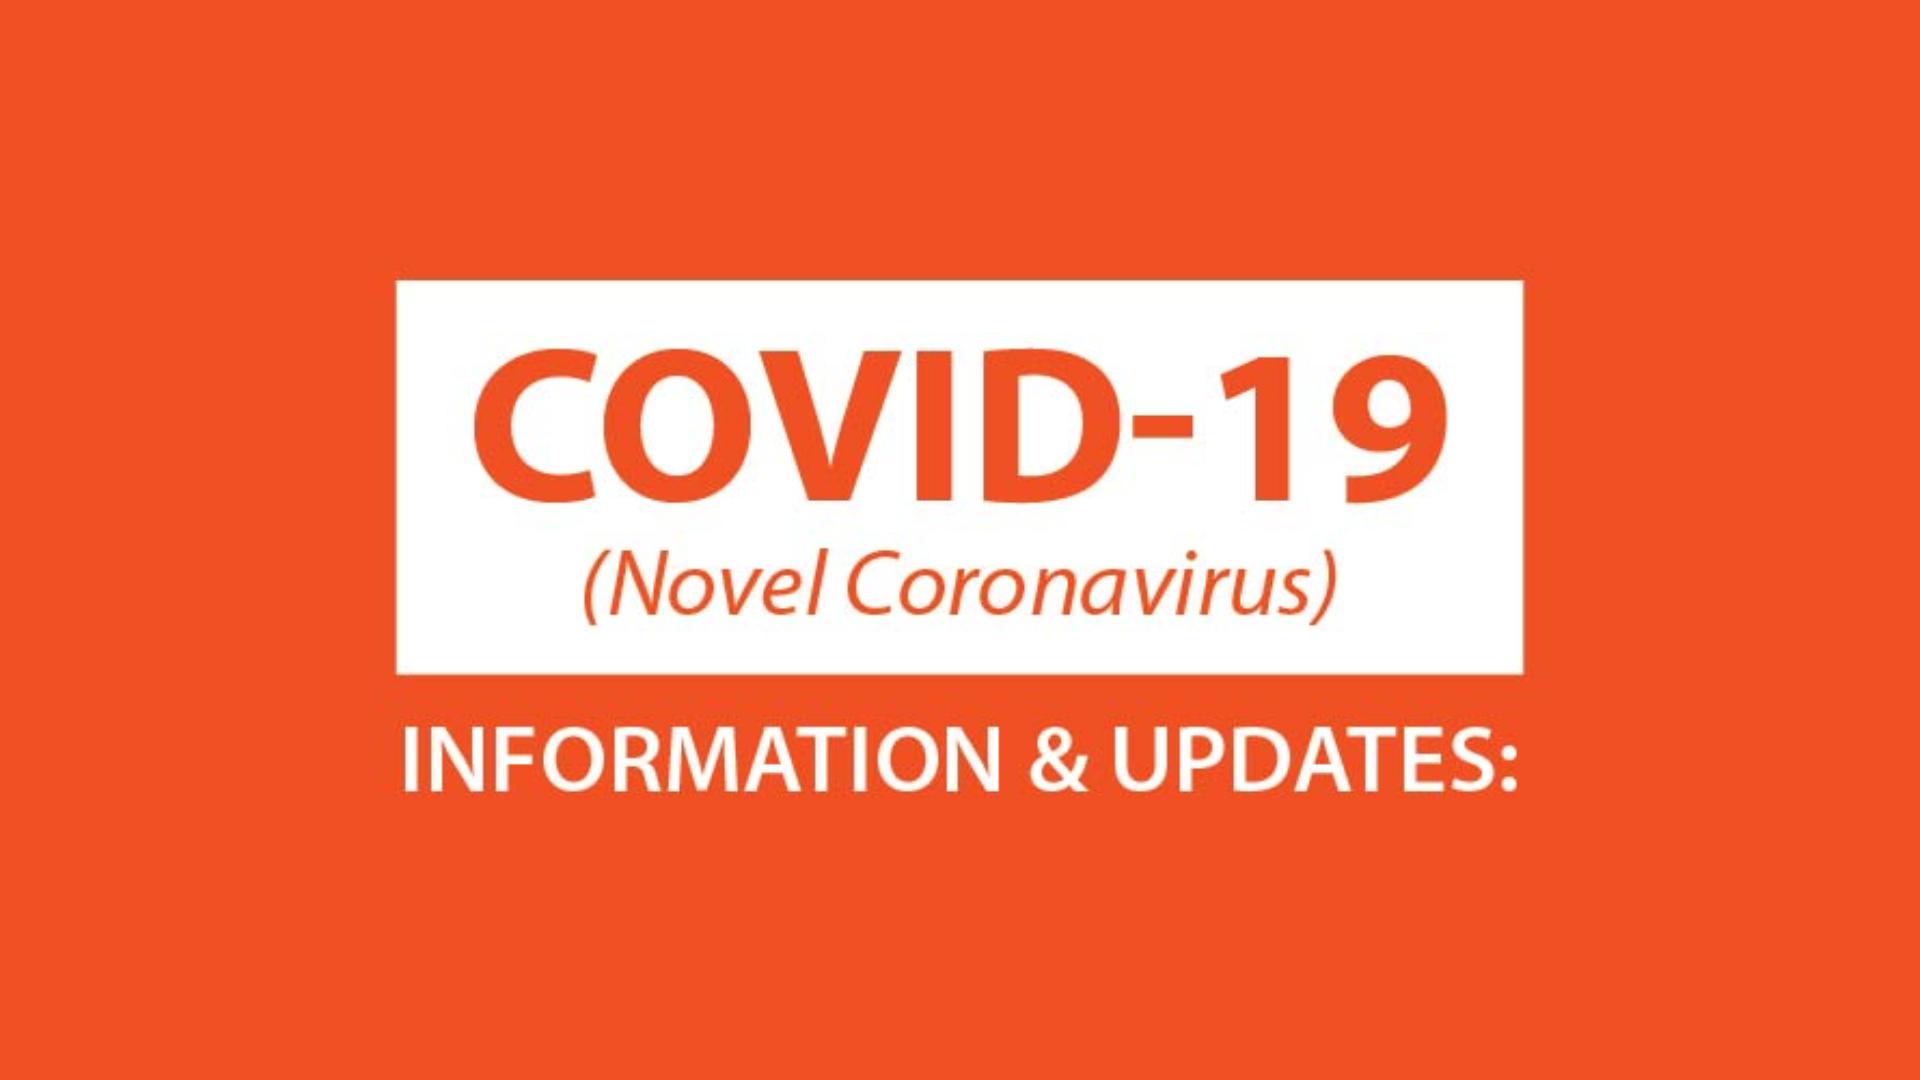 Covid-19 Information & Updates